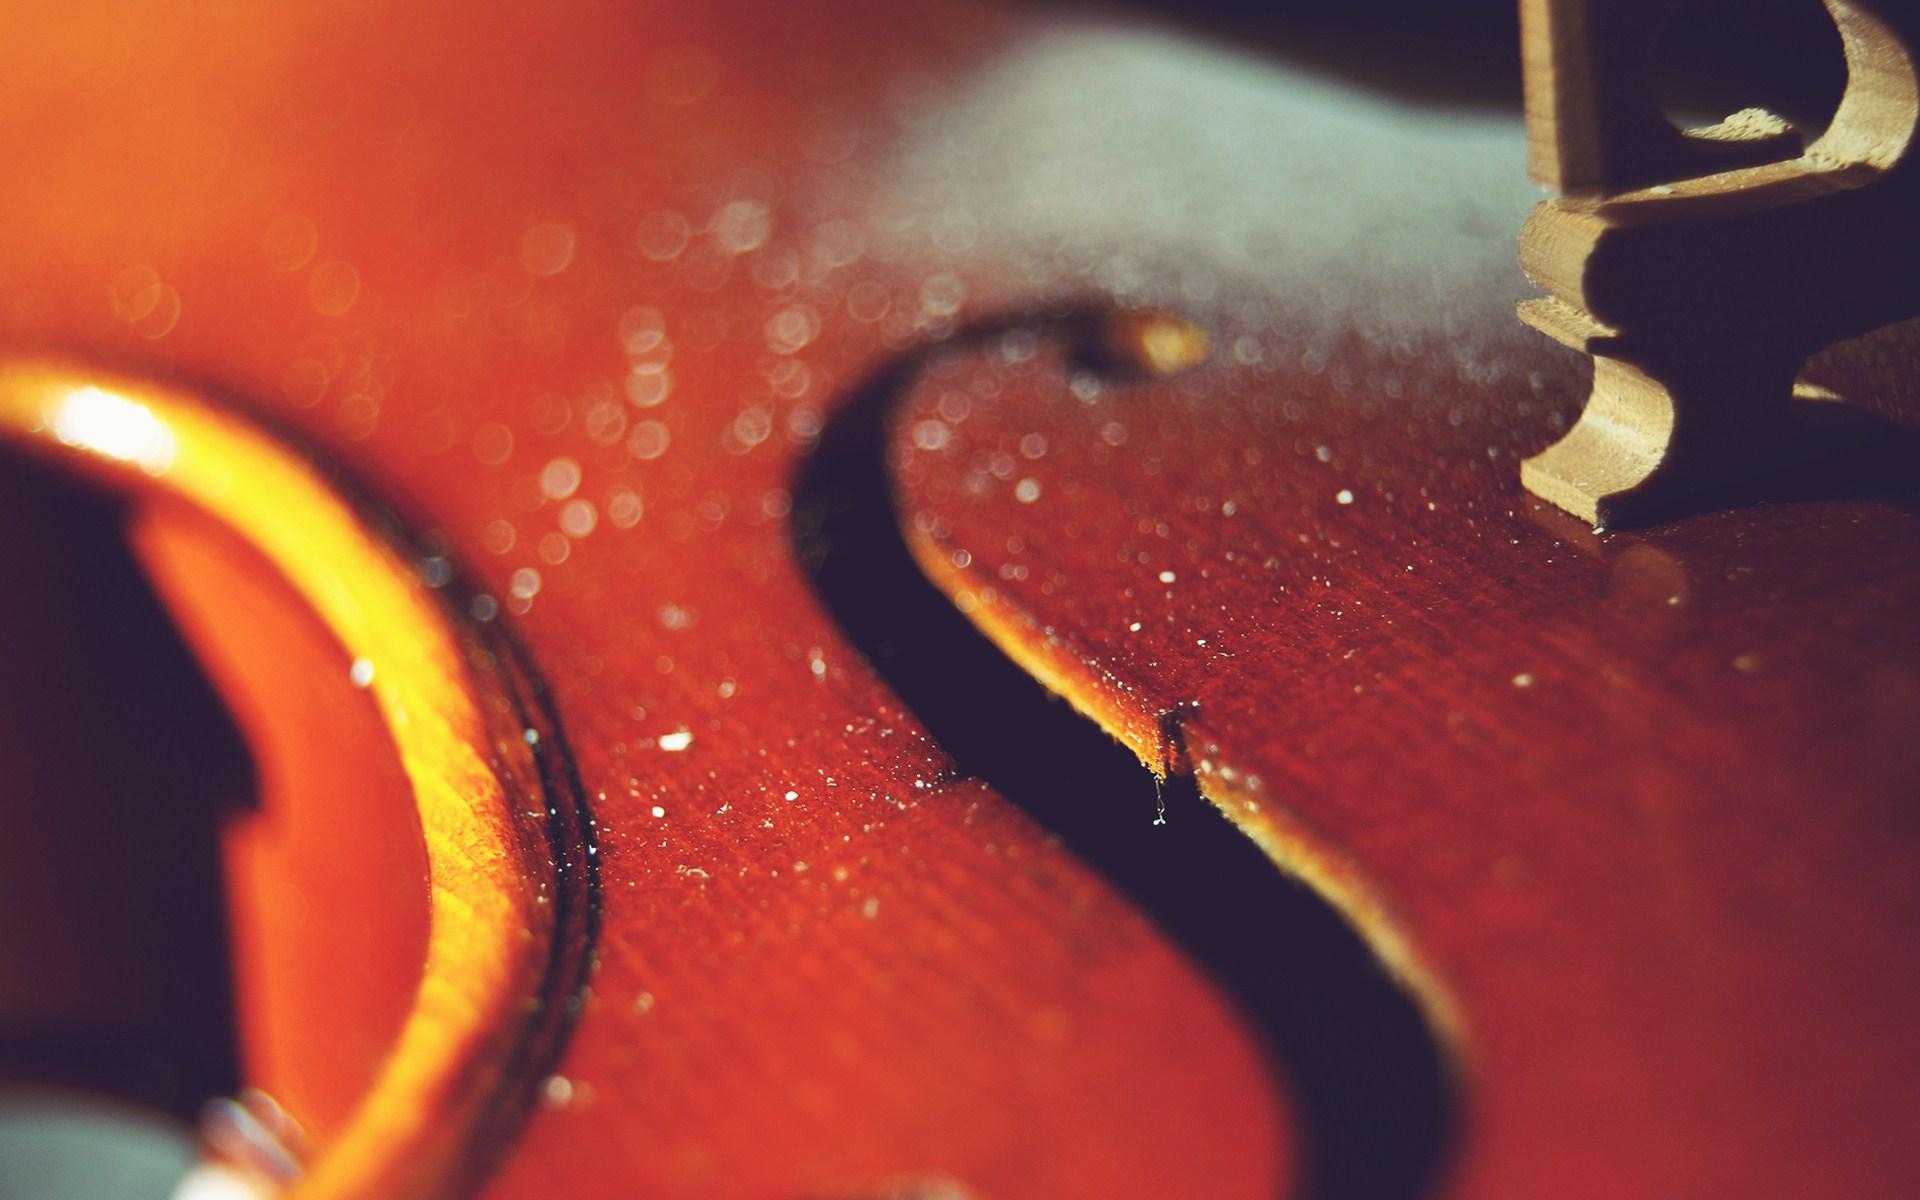 Violin Macro Photo